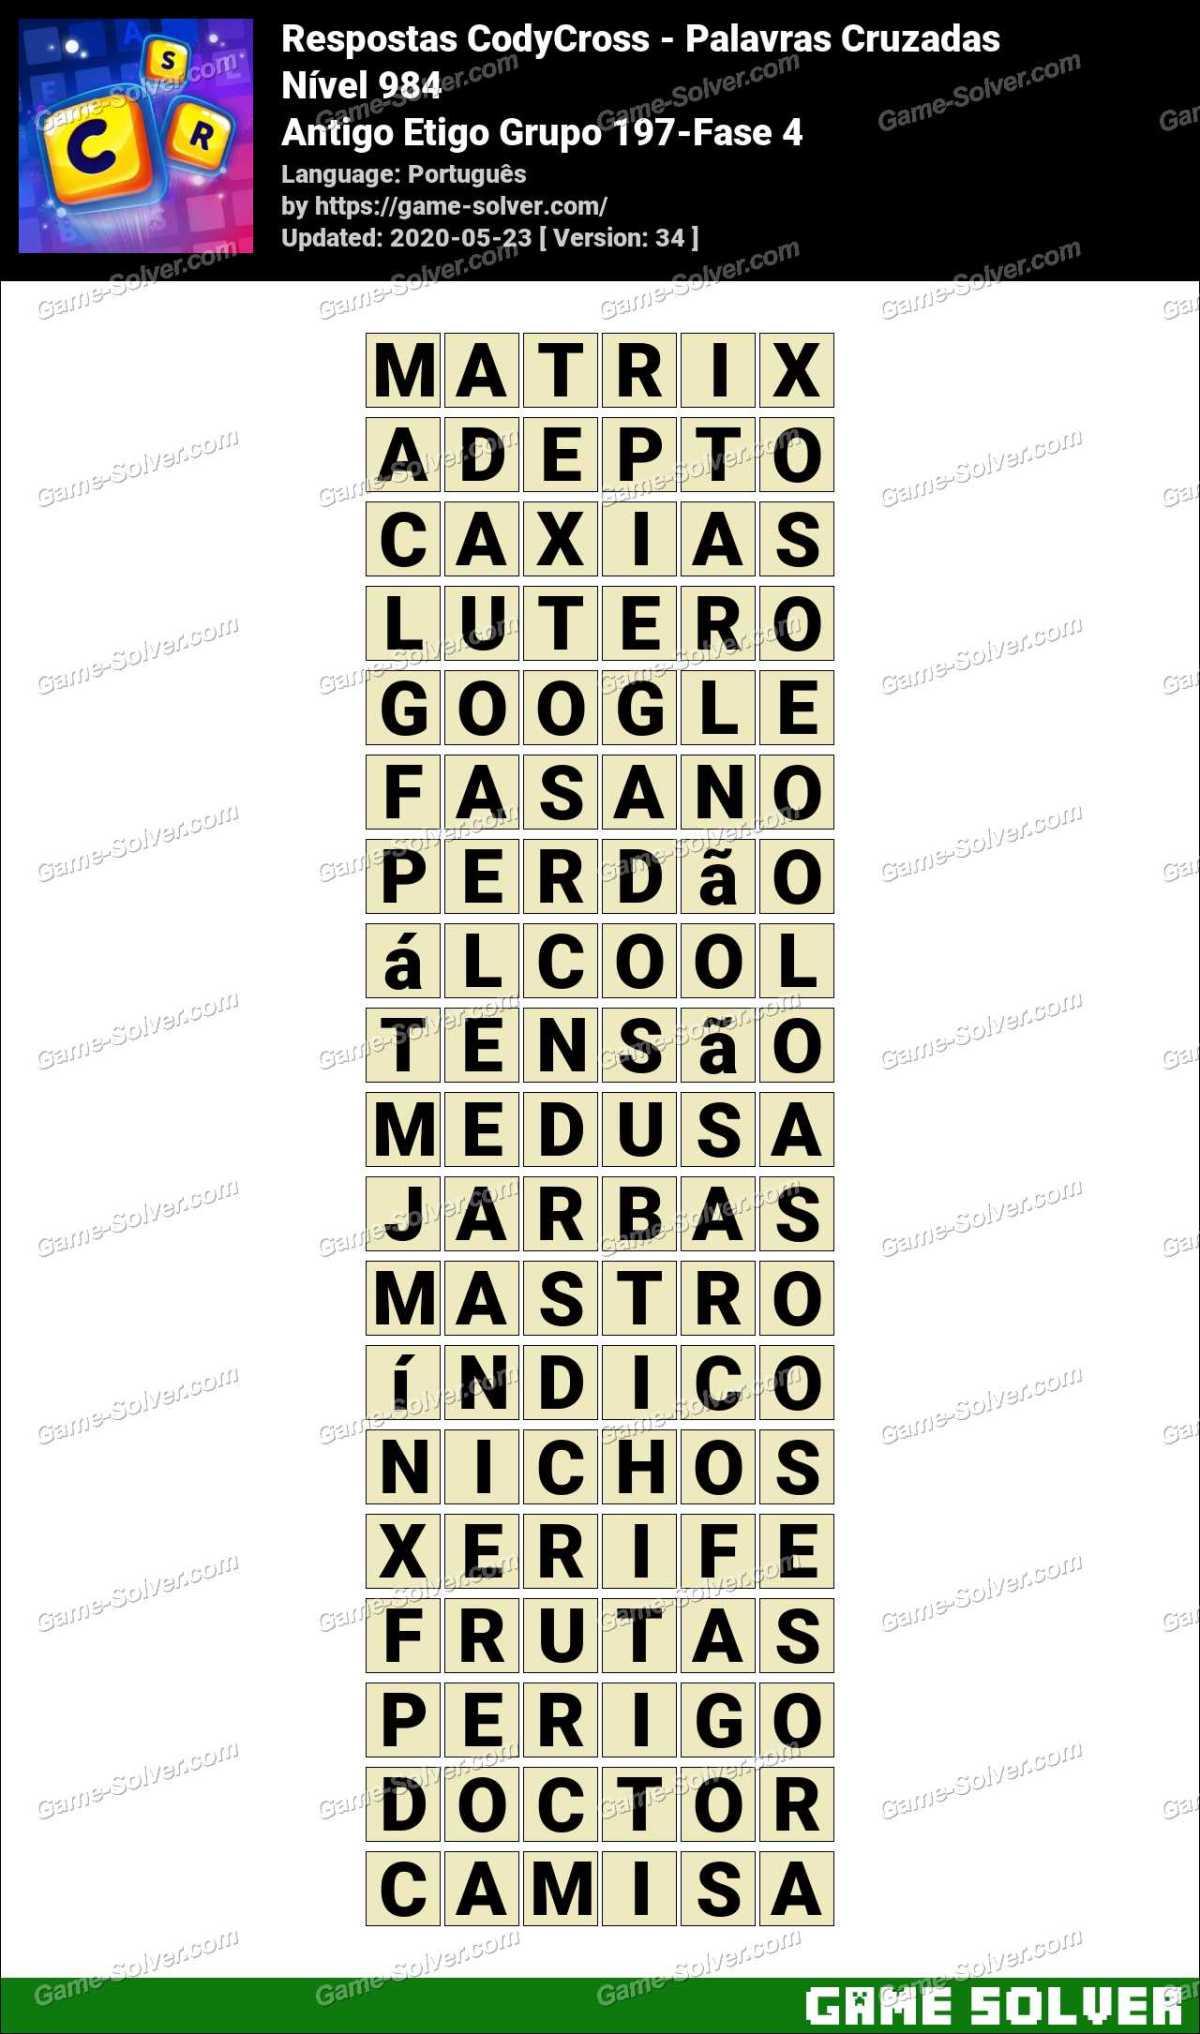 Respostas CodyCross Antigo Etigo Grupo 197-Fase 4